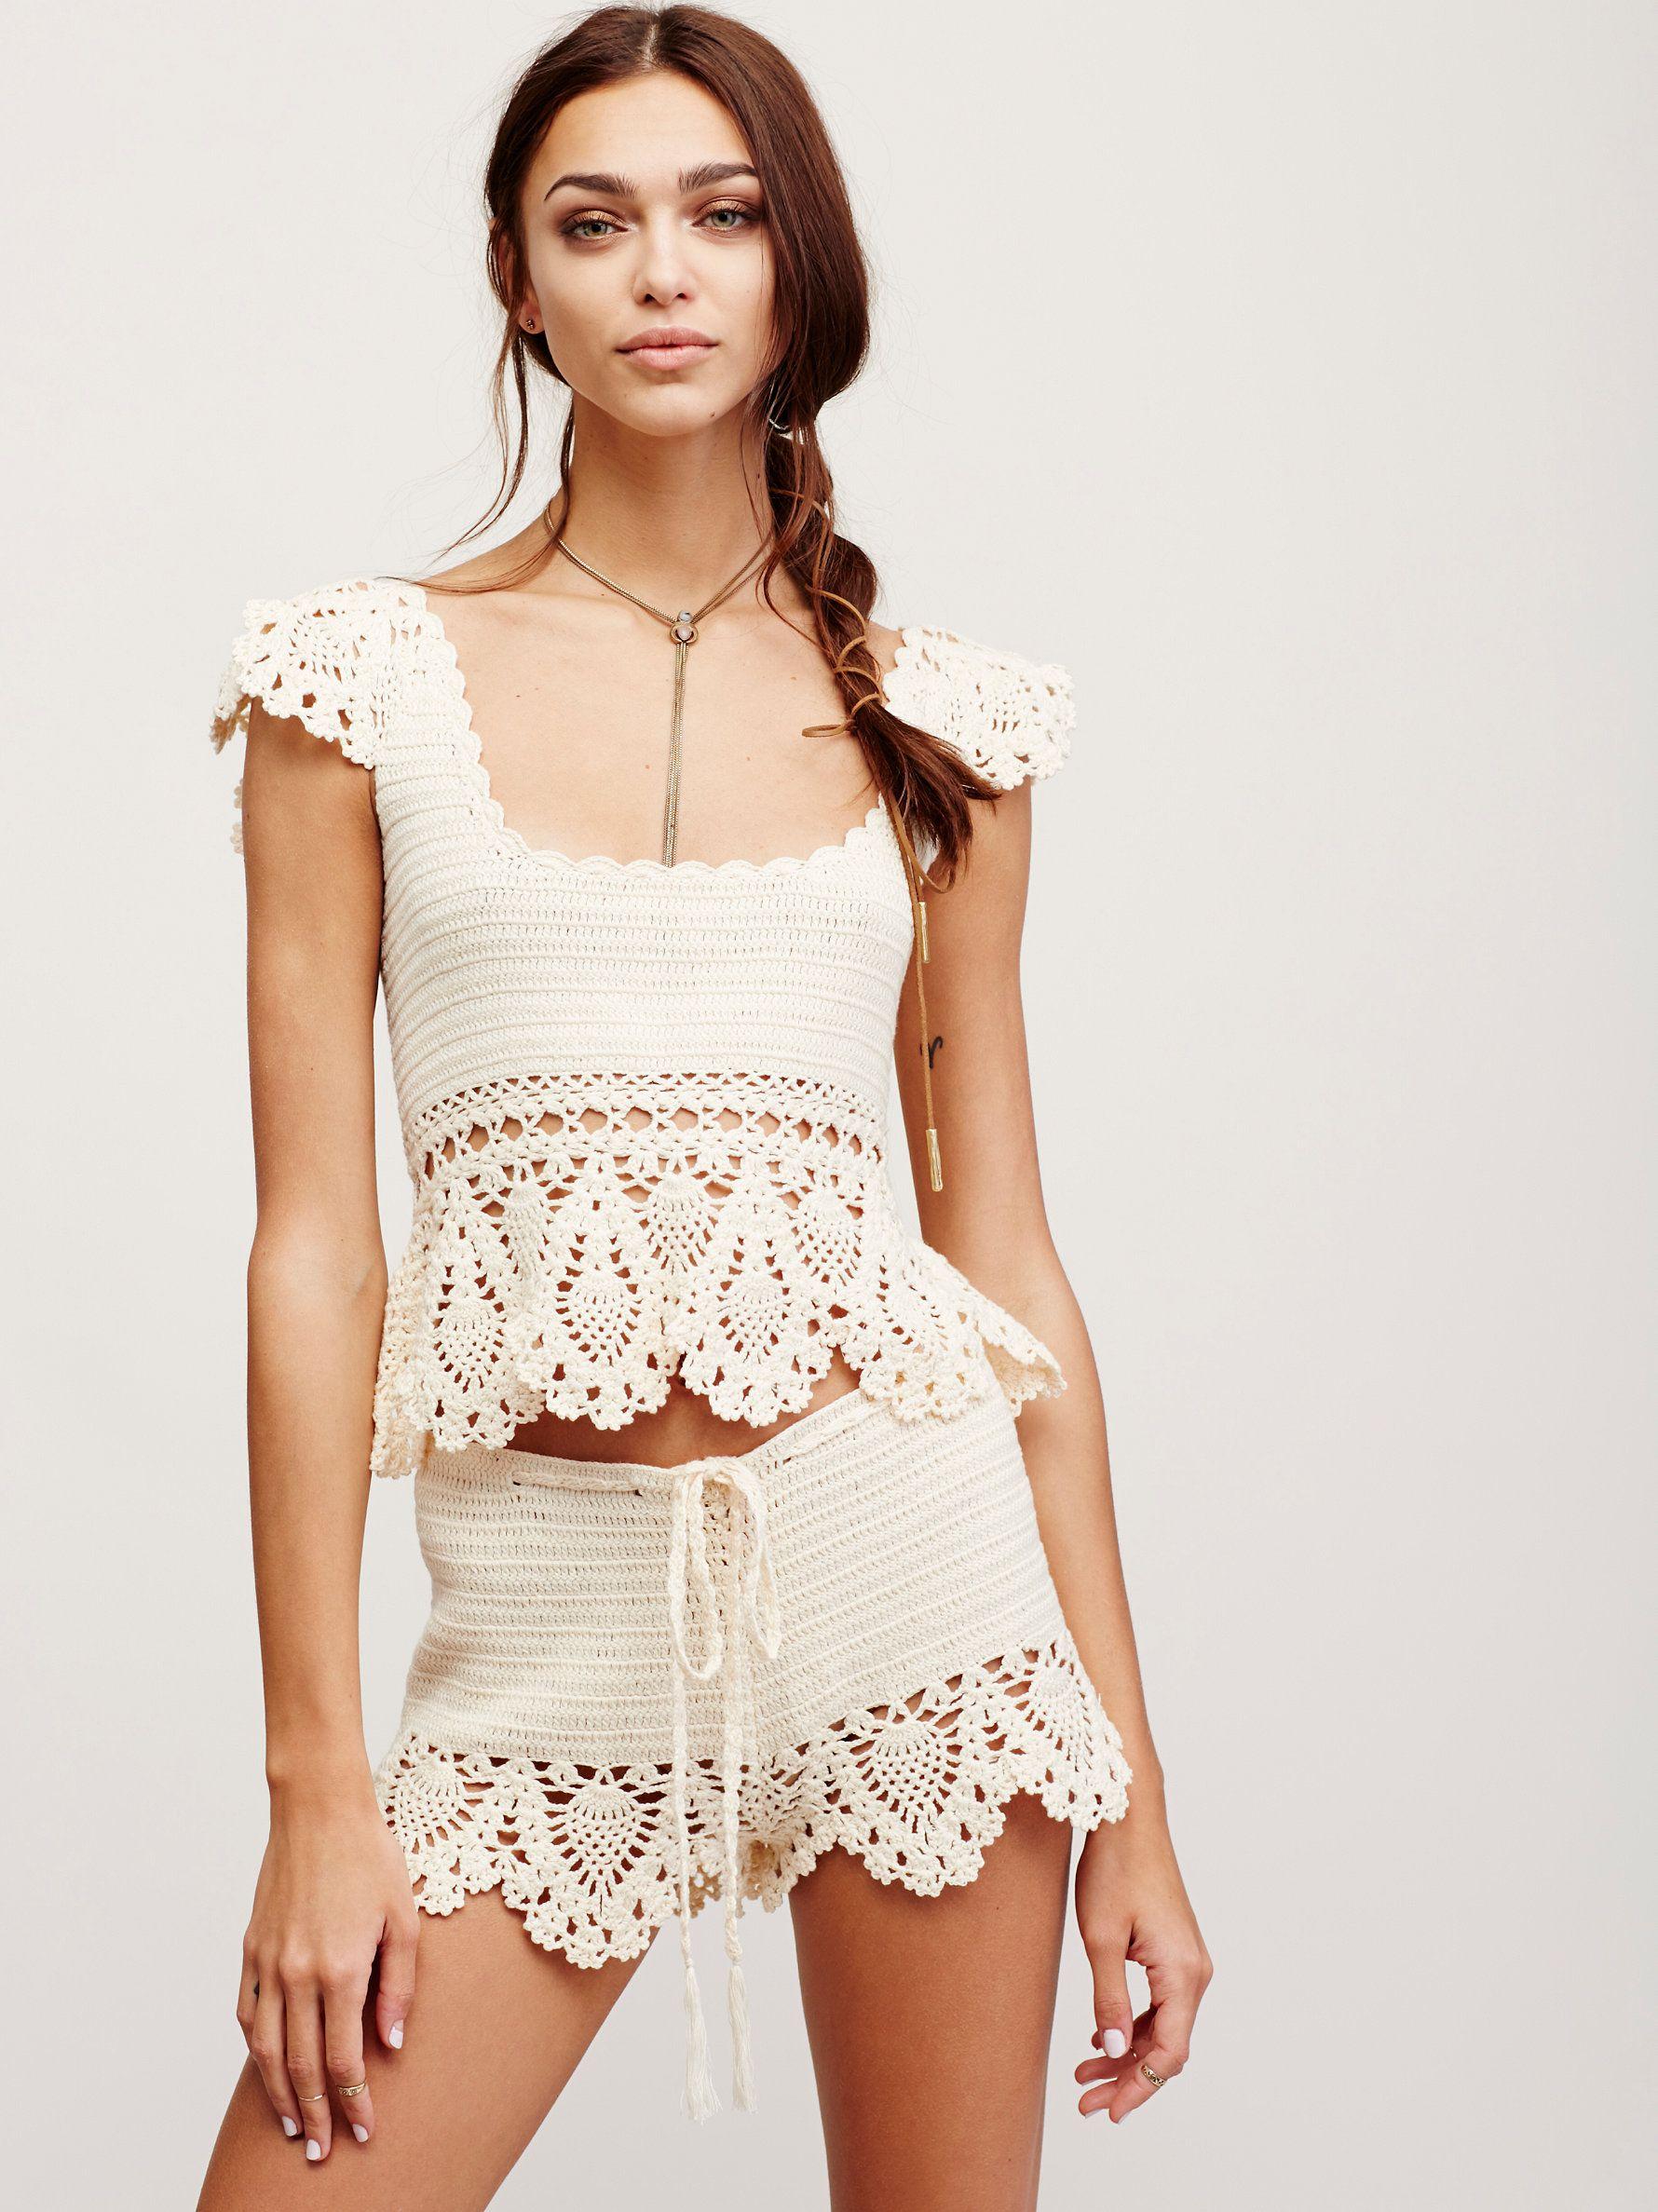 Crochet Babe Top | Cotton crochet crop top featuring scalloped trim along the…